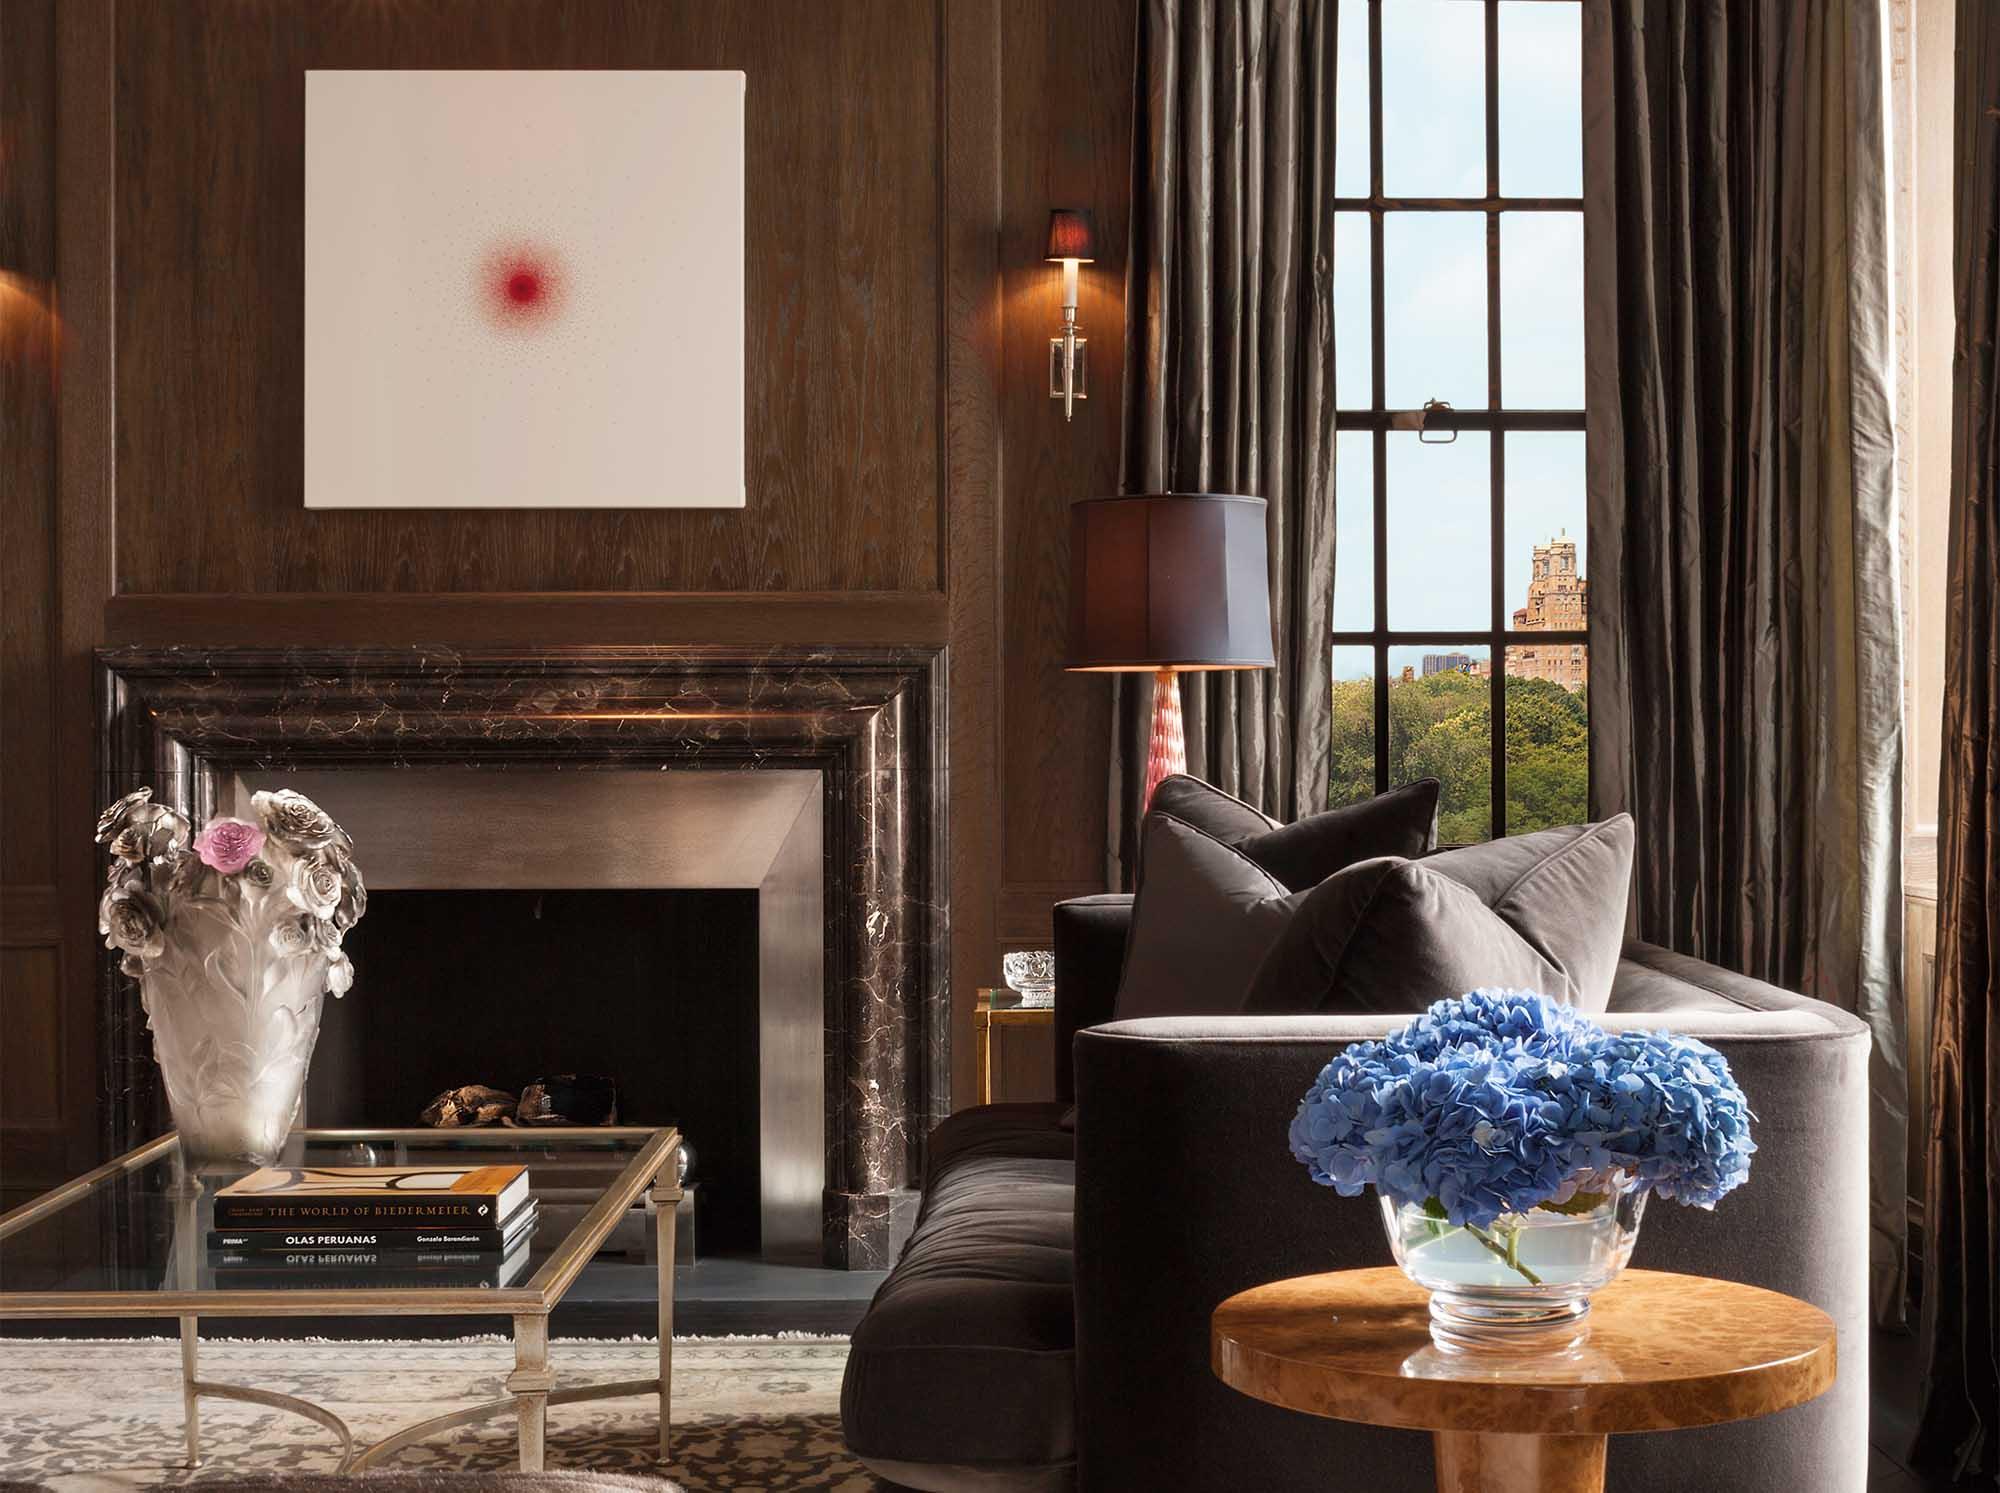 79th Street Apartment, Lenox Hill, Manhattan, Central Park transitional, modern art living room, stone metal fireplace